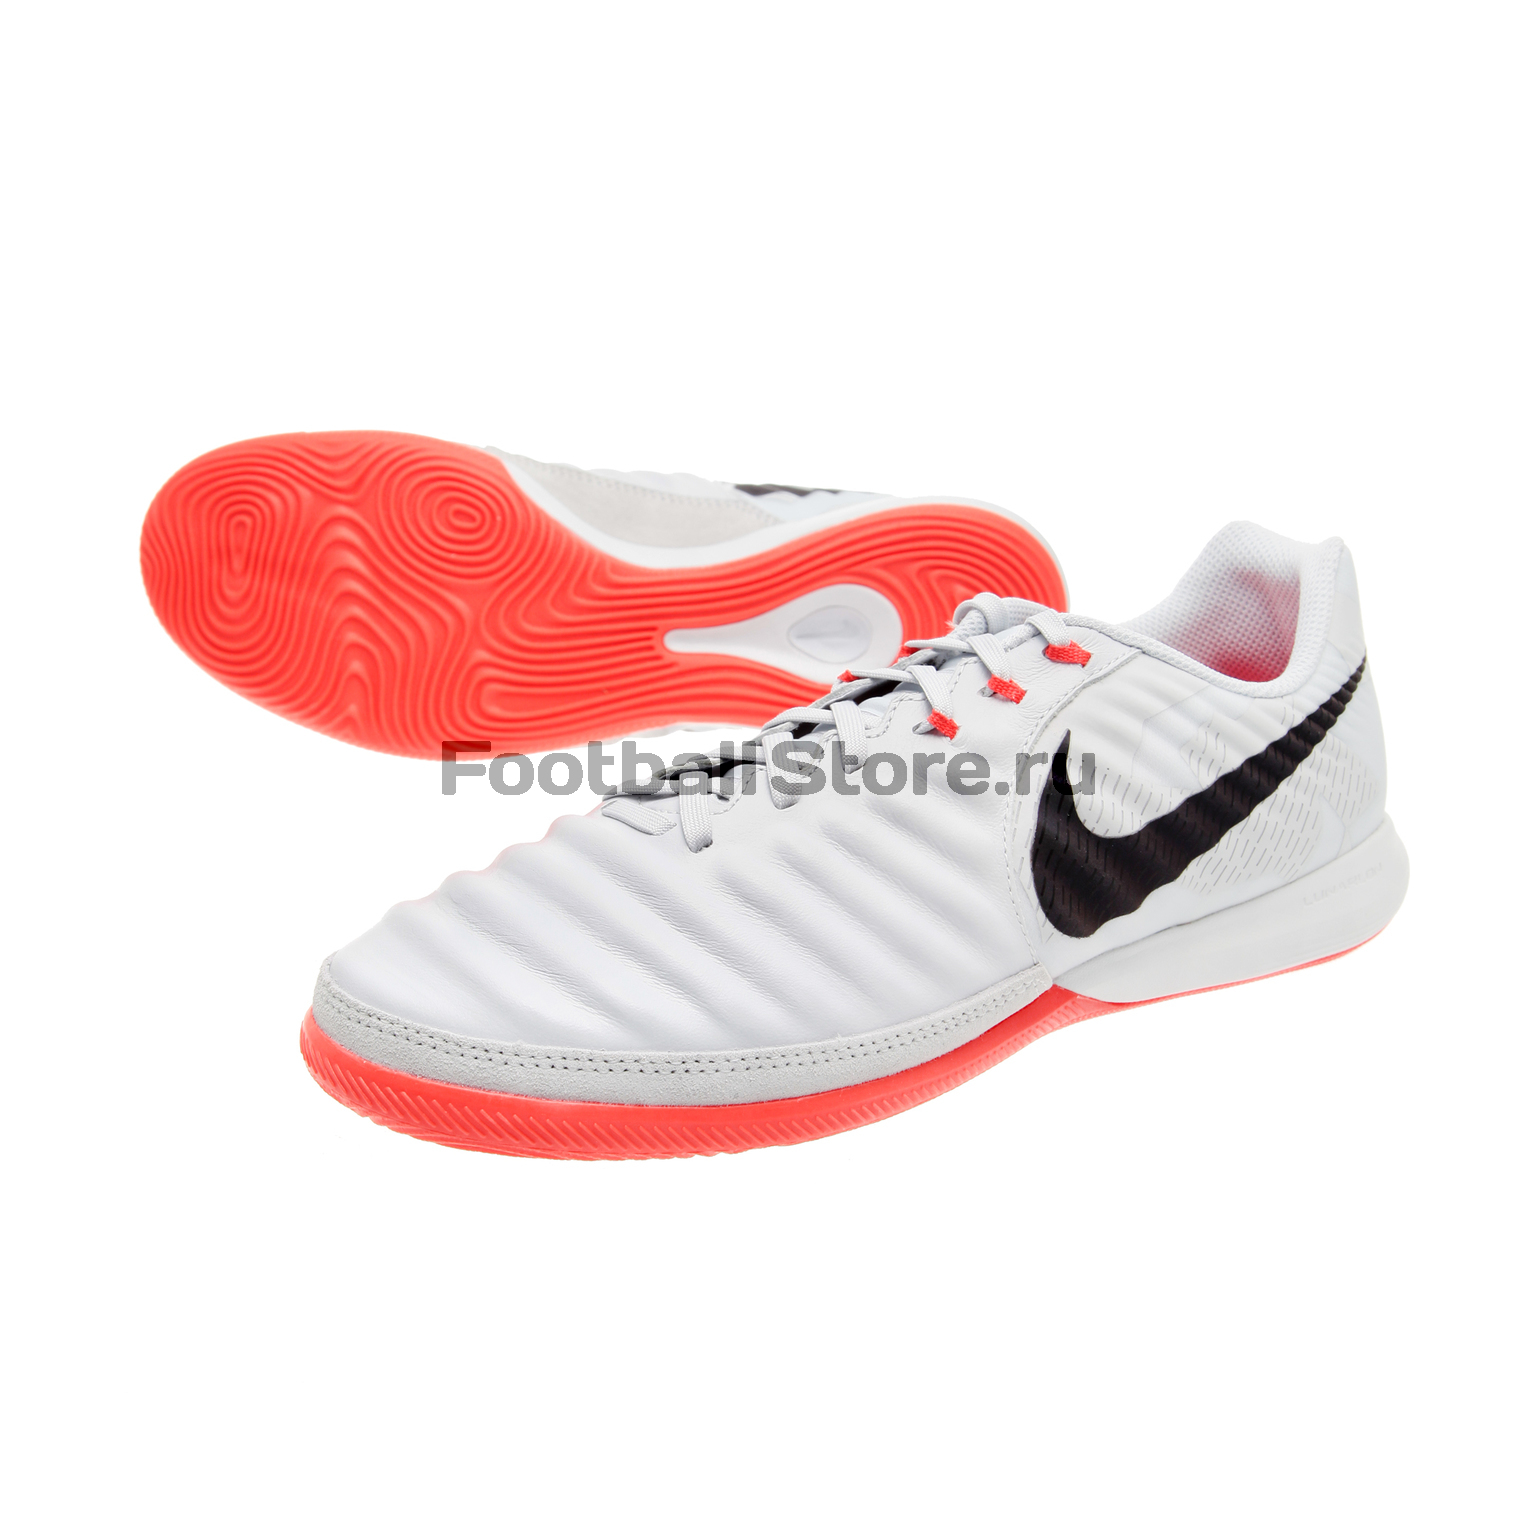 f8ab99c7 Обувь для зала Nike TiempoX Finale SE IC 897763-006 – купить футзалки в интернет  магазине footballstore, цена, фото